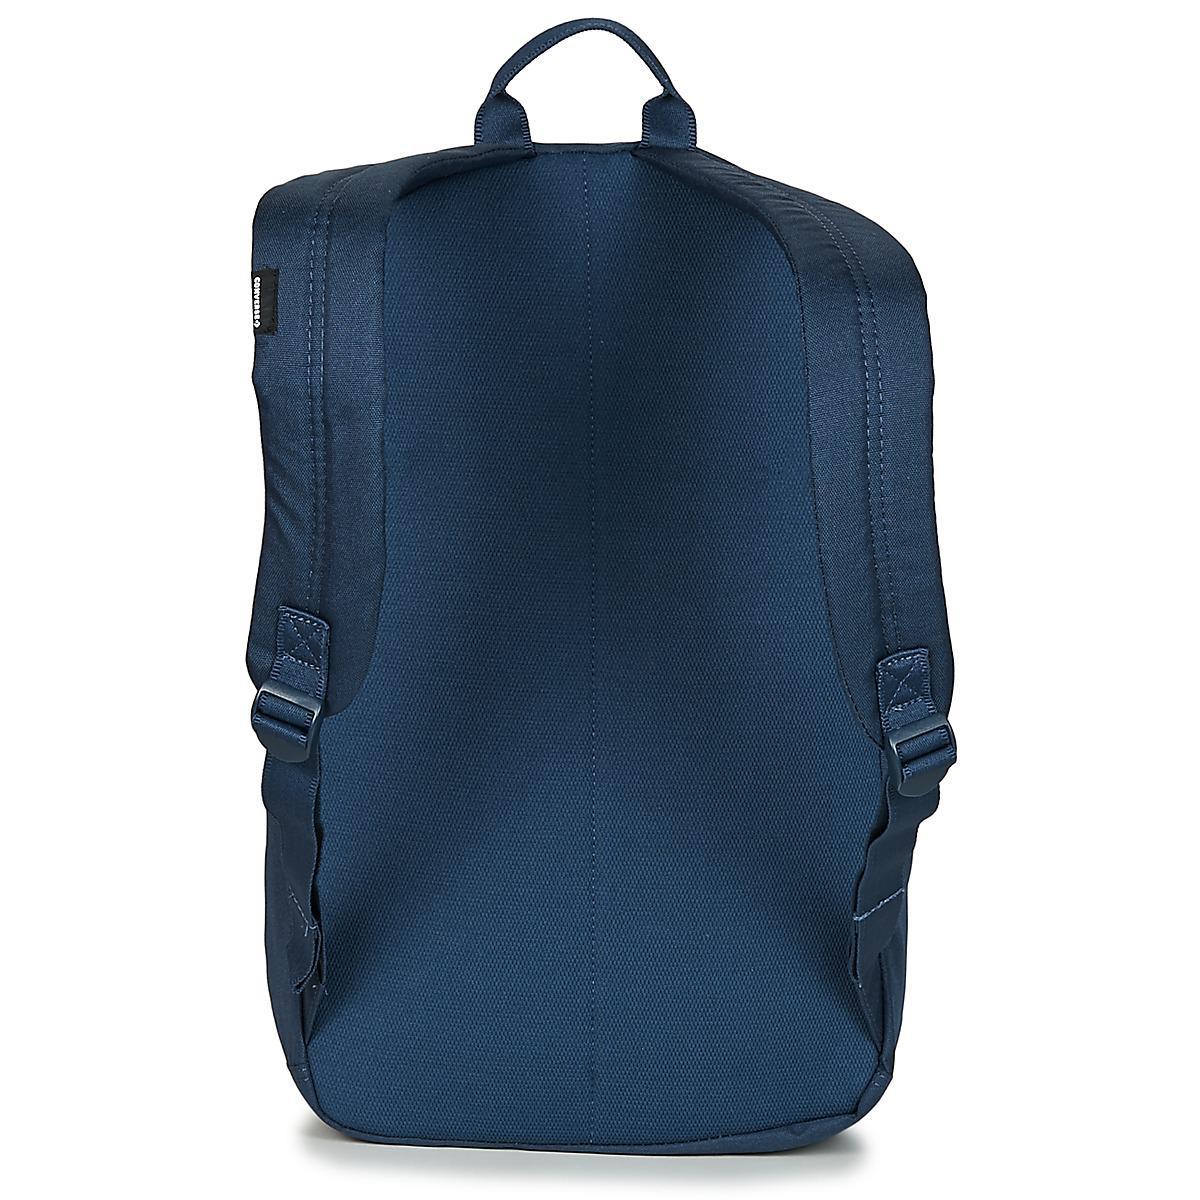 178c41d31d Converse Edc 22 Men's Backpack In Blue in Blue for Men - Lyst